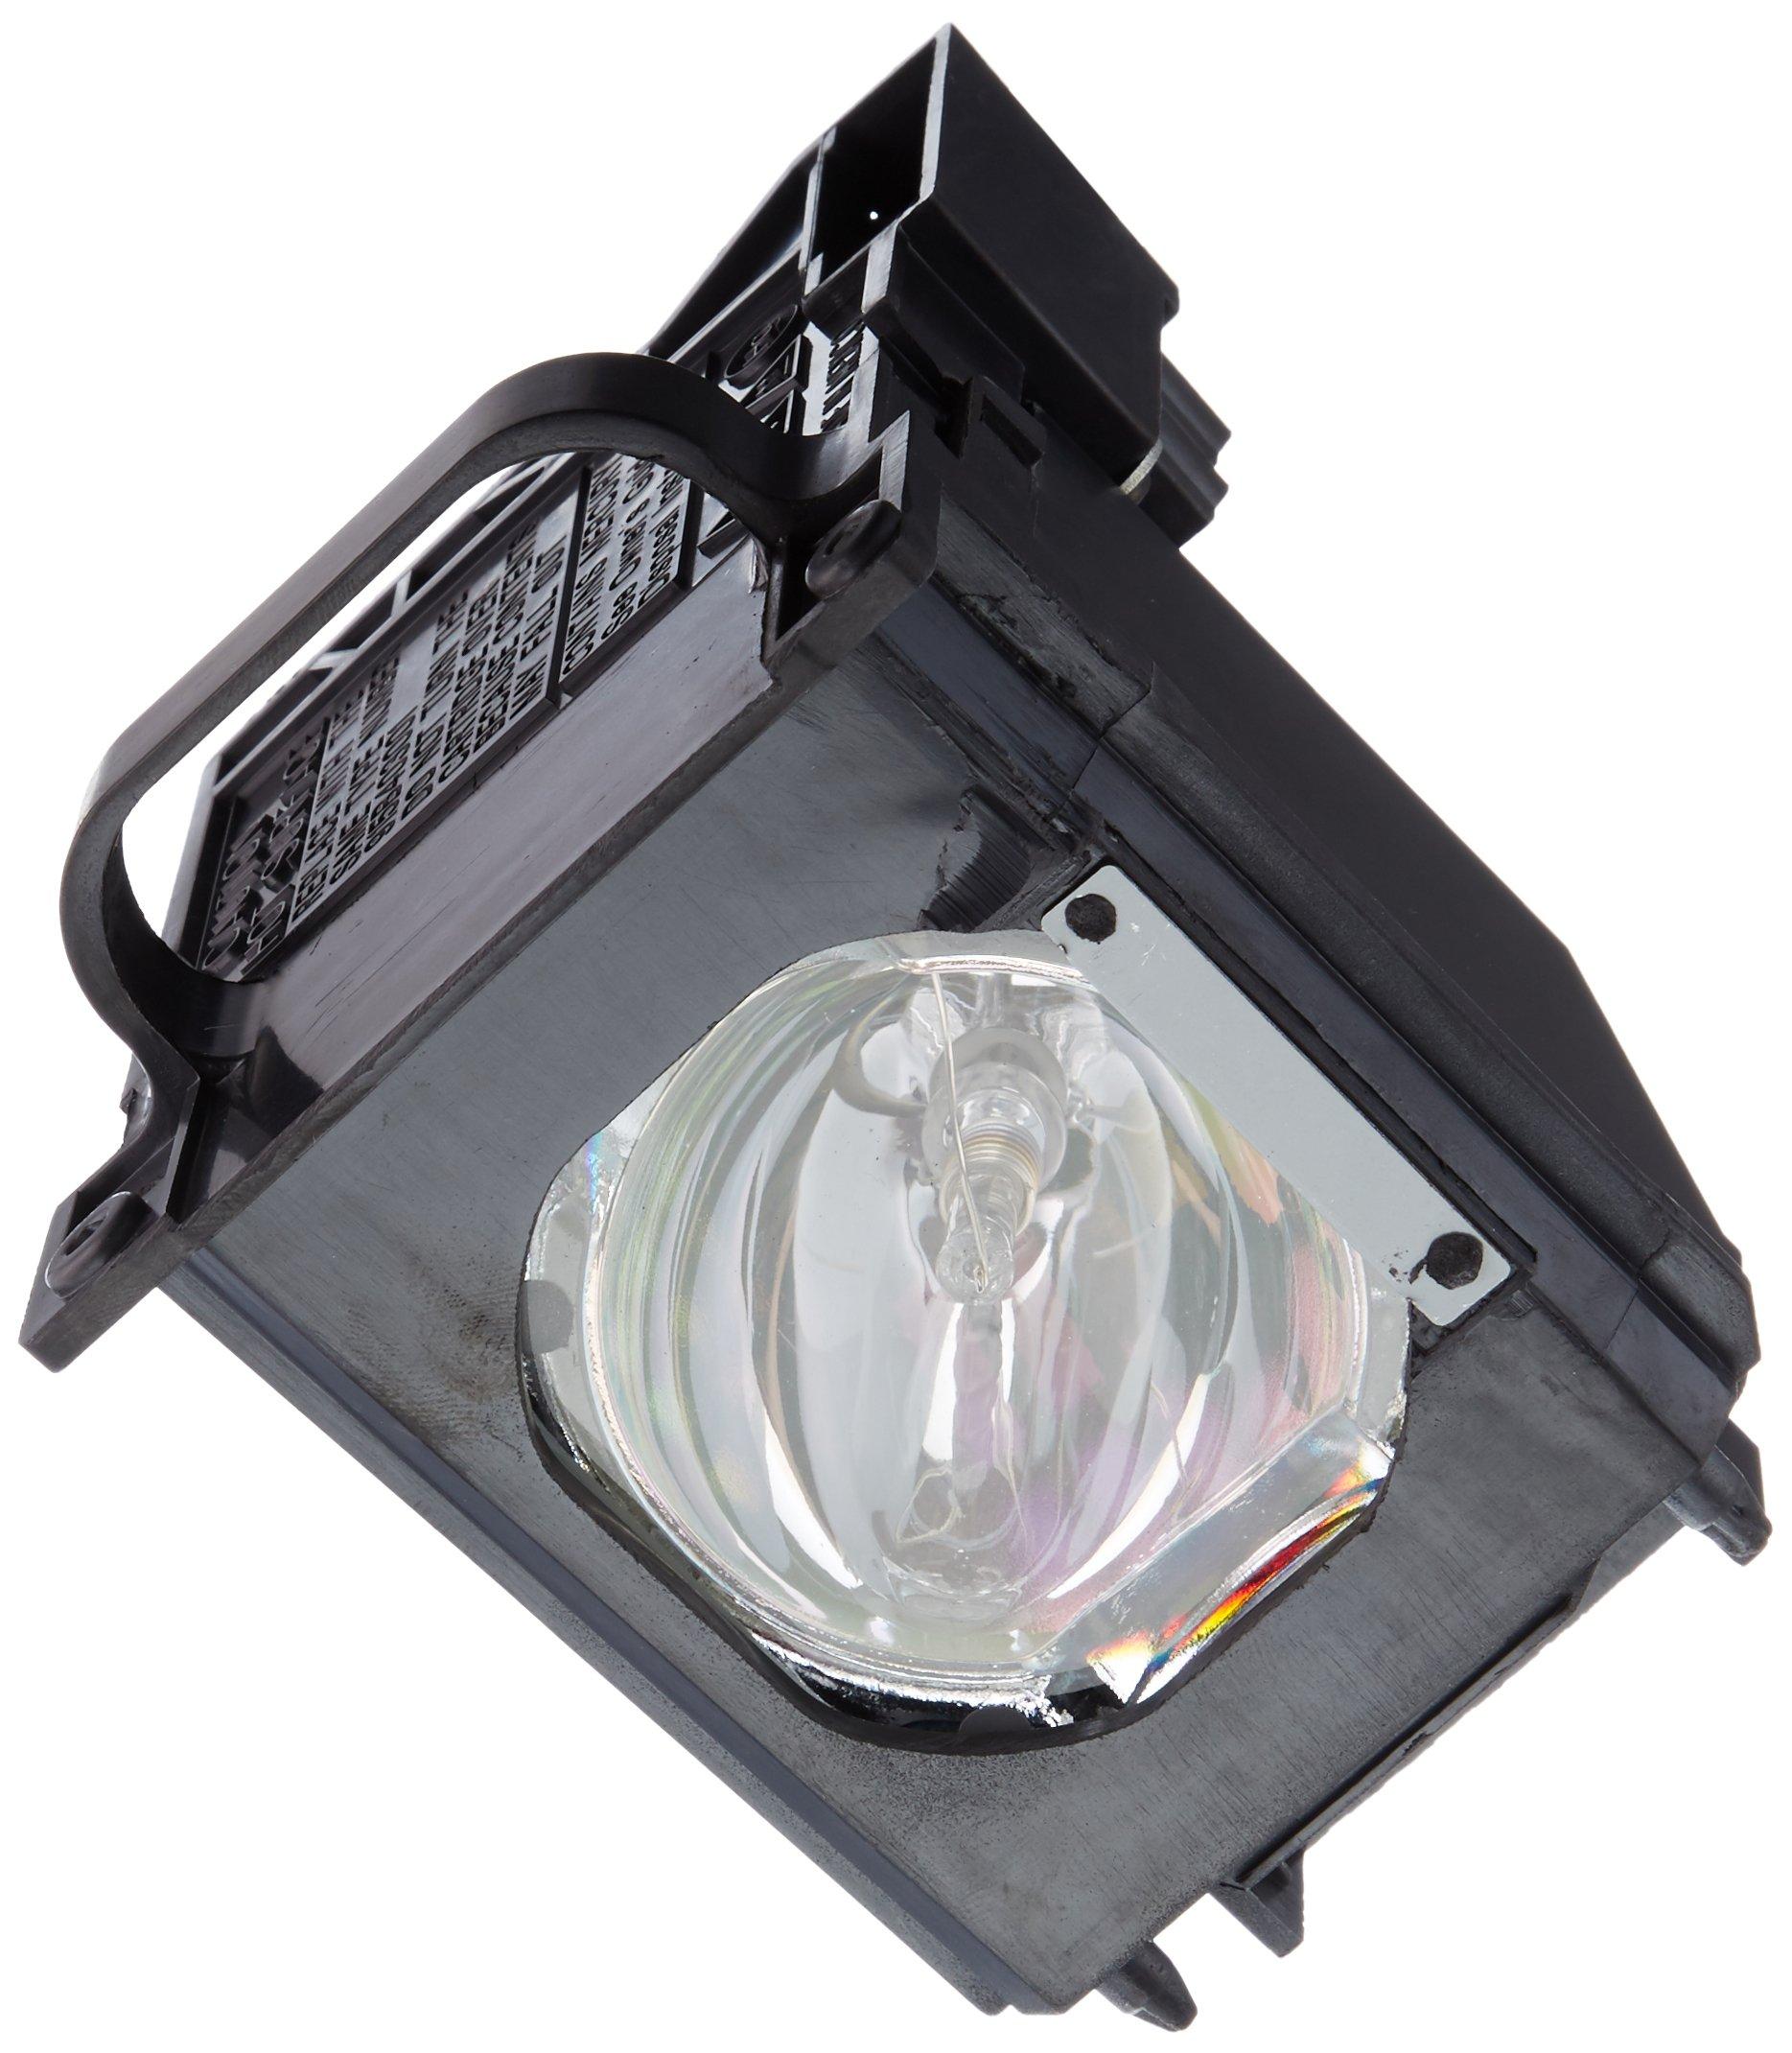 Mitsubishi WD-65735 180 Watt TV Lamp Replacement by FI Lamps